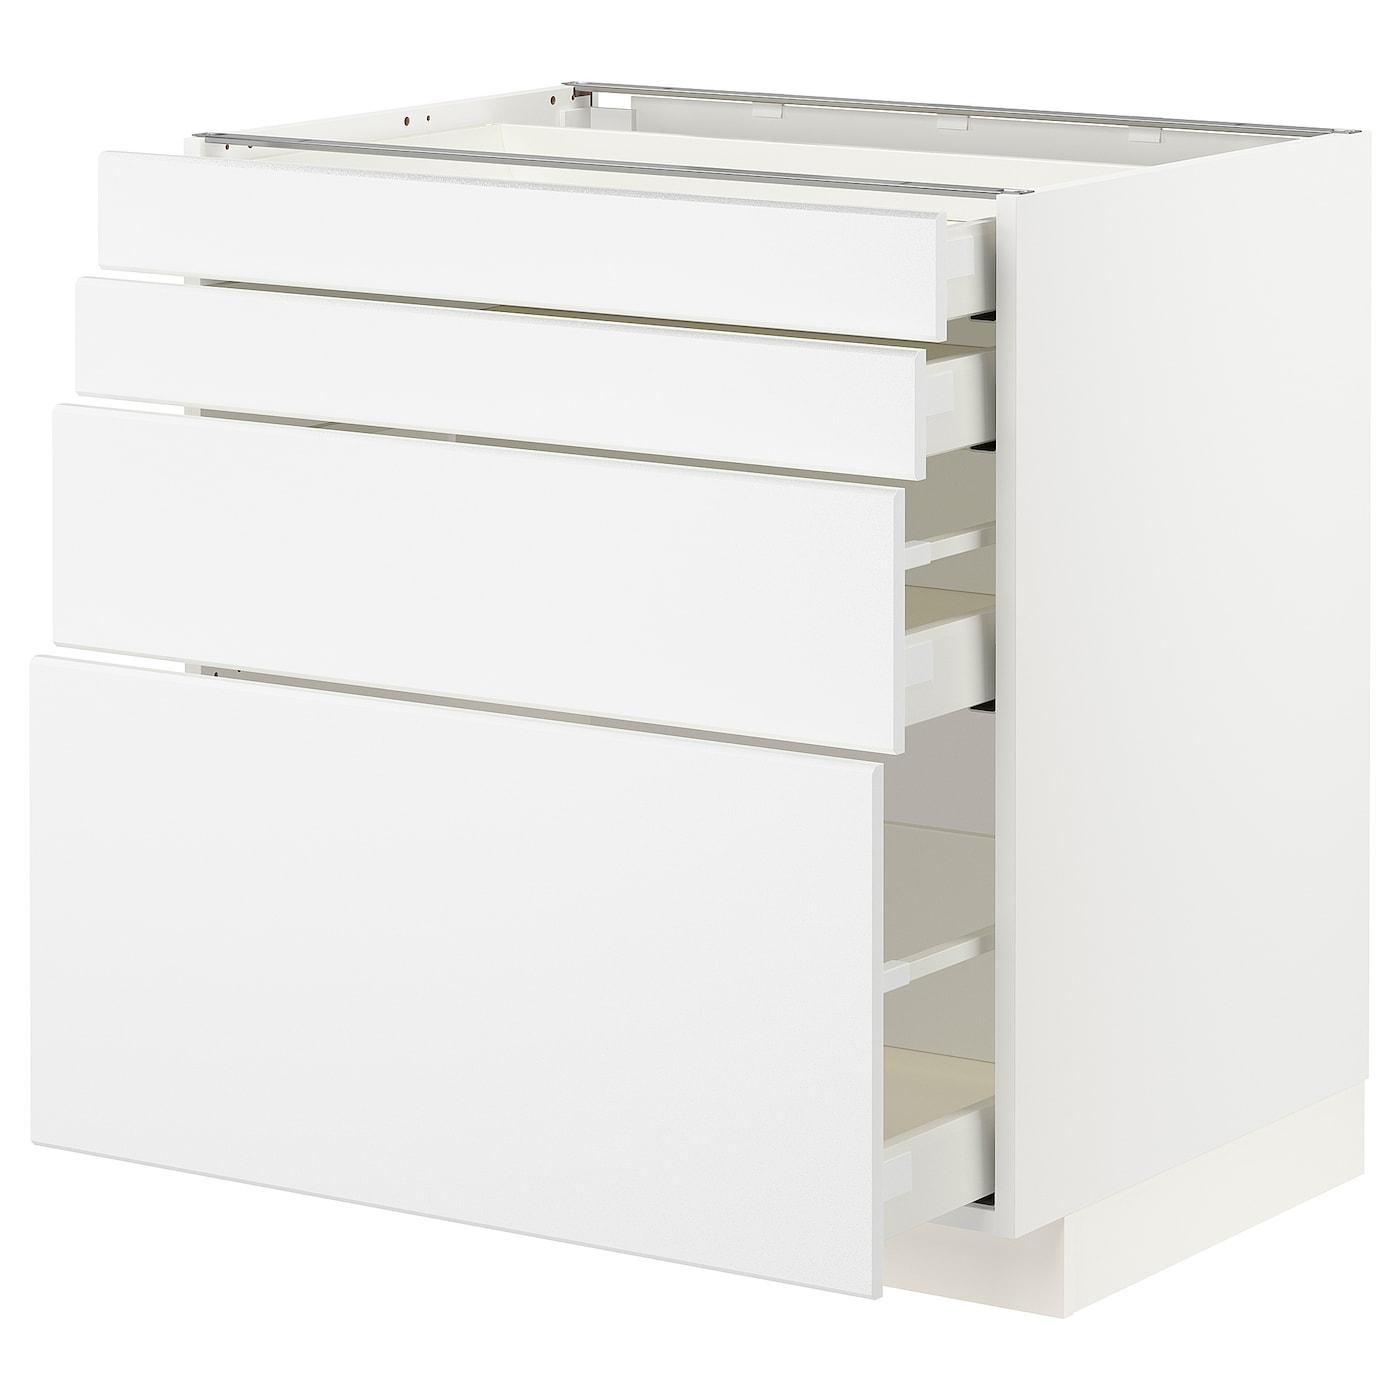 METOD / MAXIMERA Élt bas 15 faces/15 tiroirs - blanc/Kungsbacka blanc mat  15x15 cm